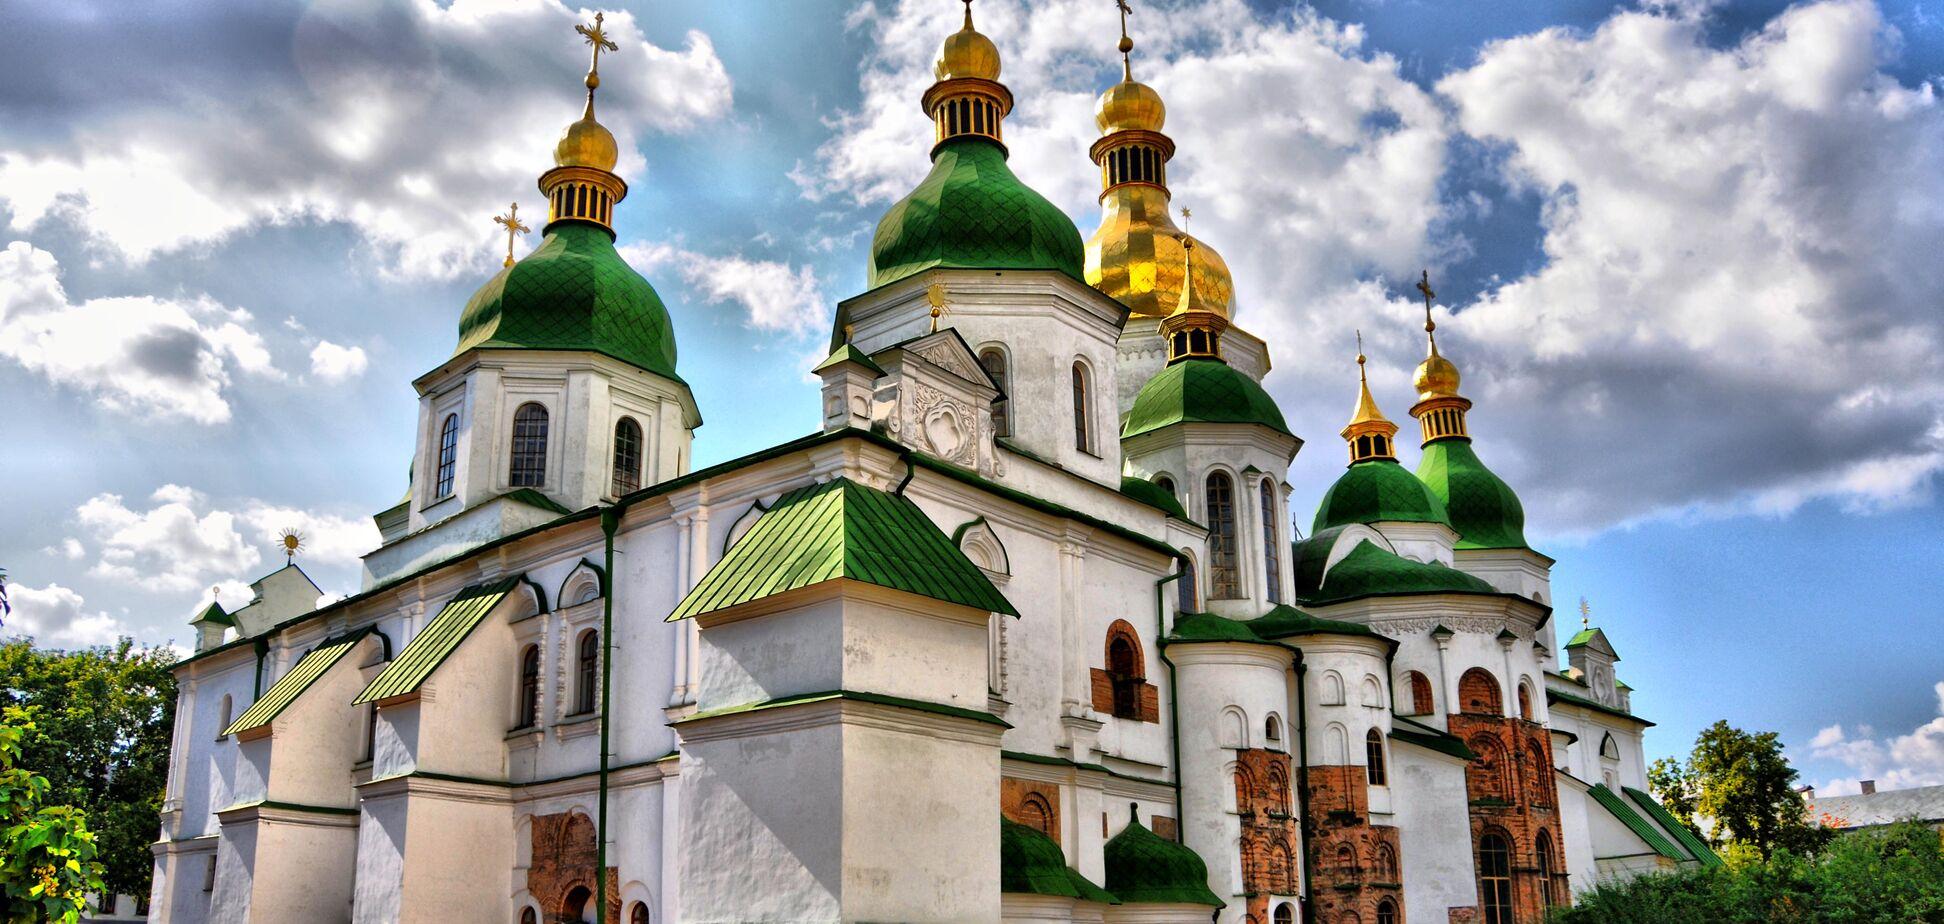 УПЦ КП жестко ответила на выпад МИД РФ